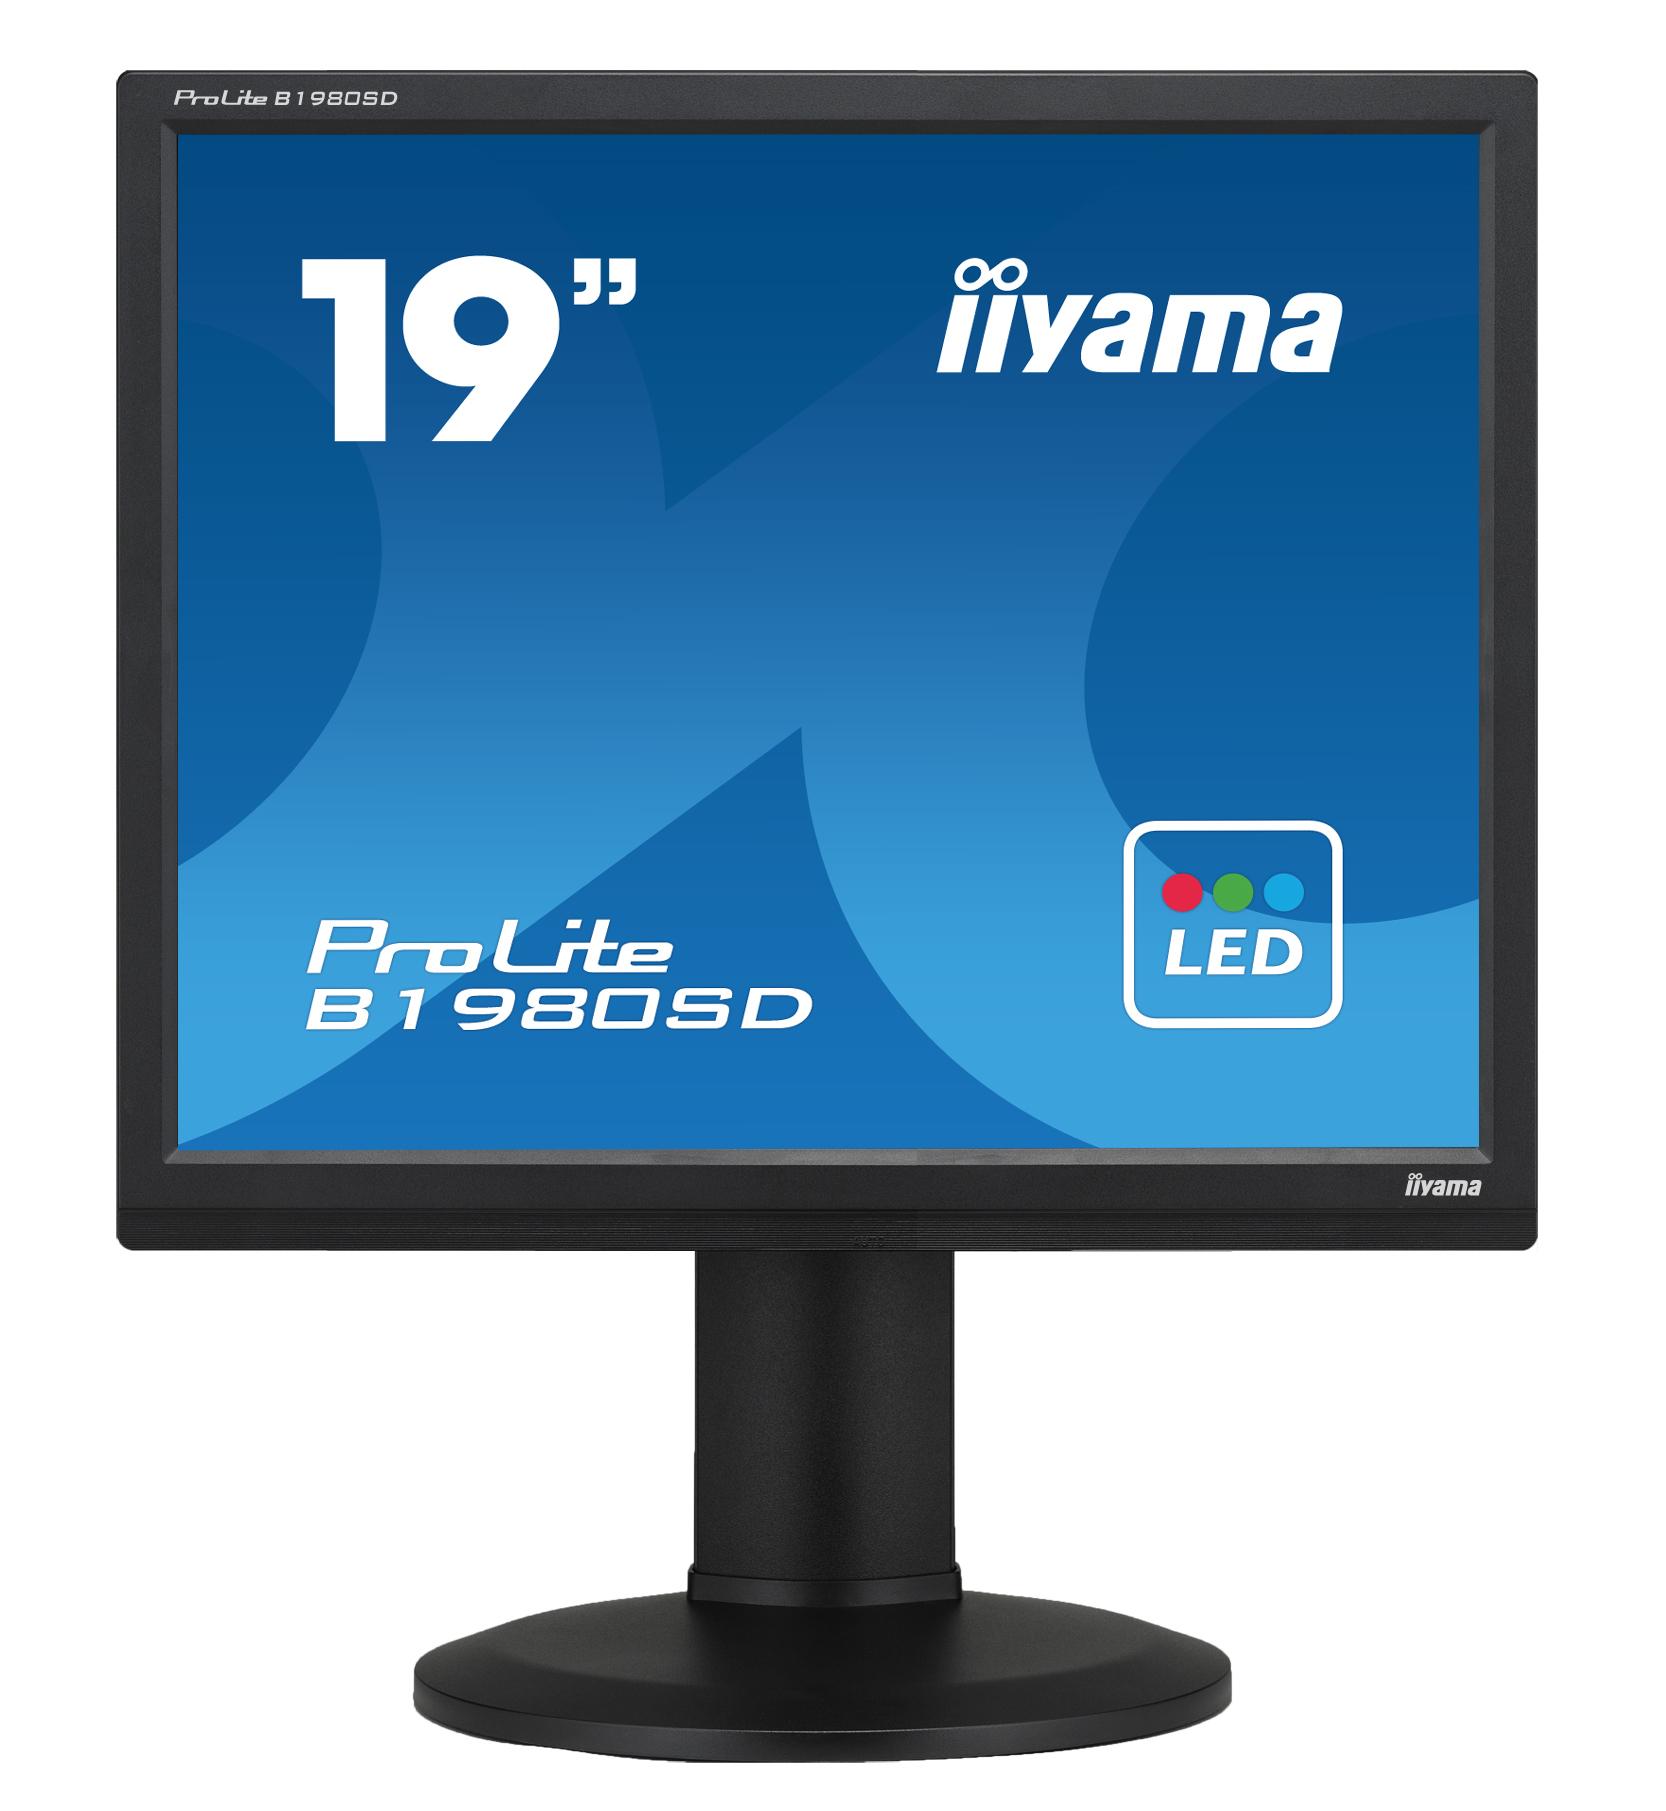 Iiyama ProLite B1980SD - 48,3 cm (19 Zoll) - 1280 x 1024 Pixel - LED - LED - 5 ms - Schwarz